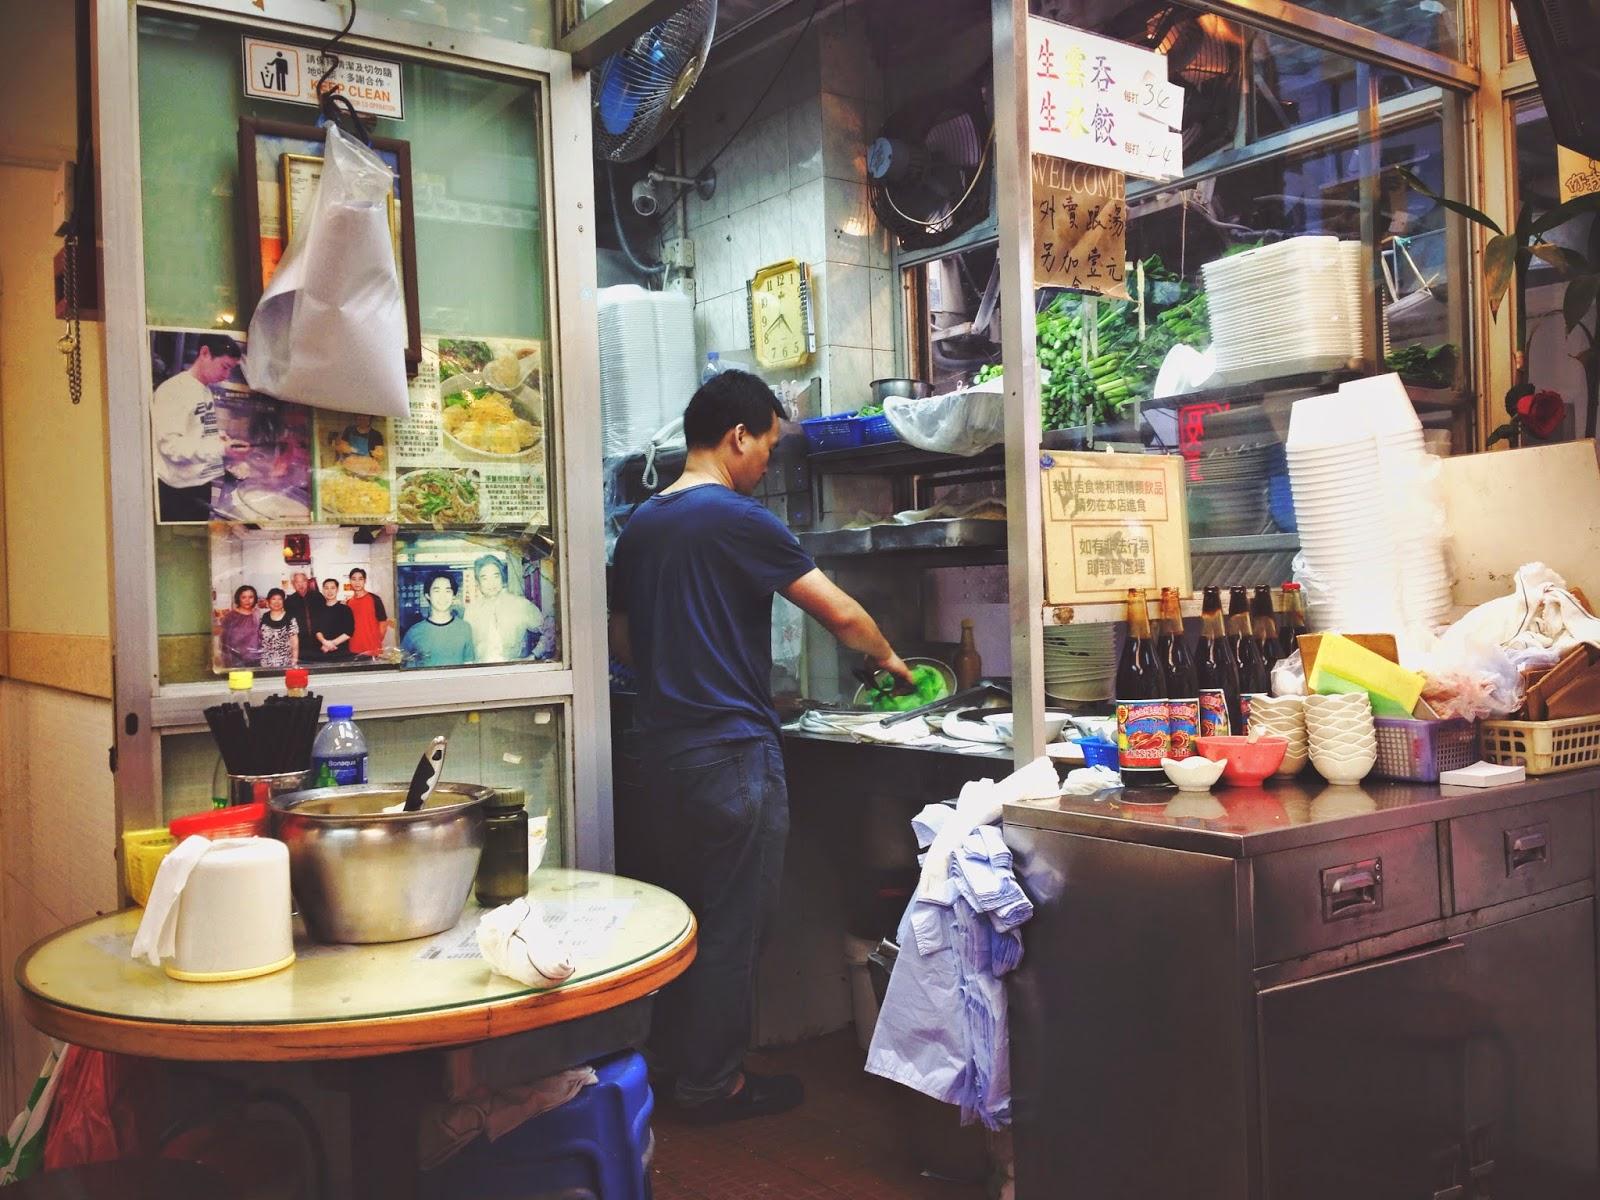 Lau Sum Kee Noodles at Kweilin St, Sham Shui Po